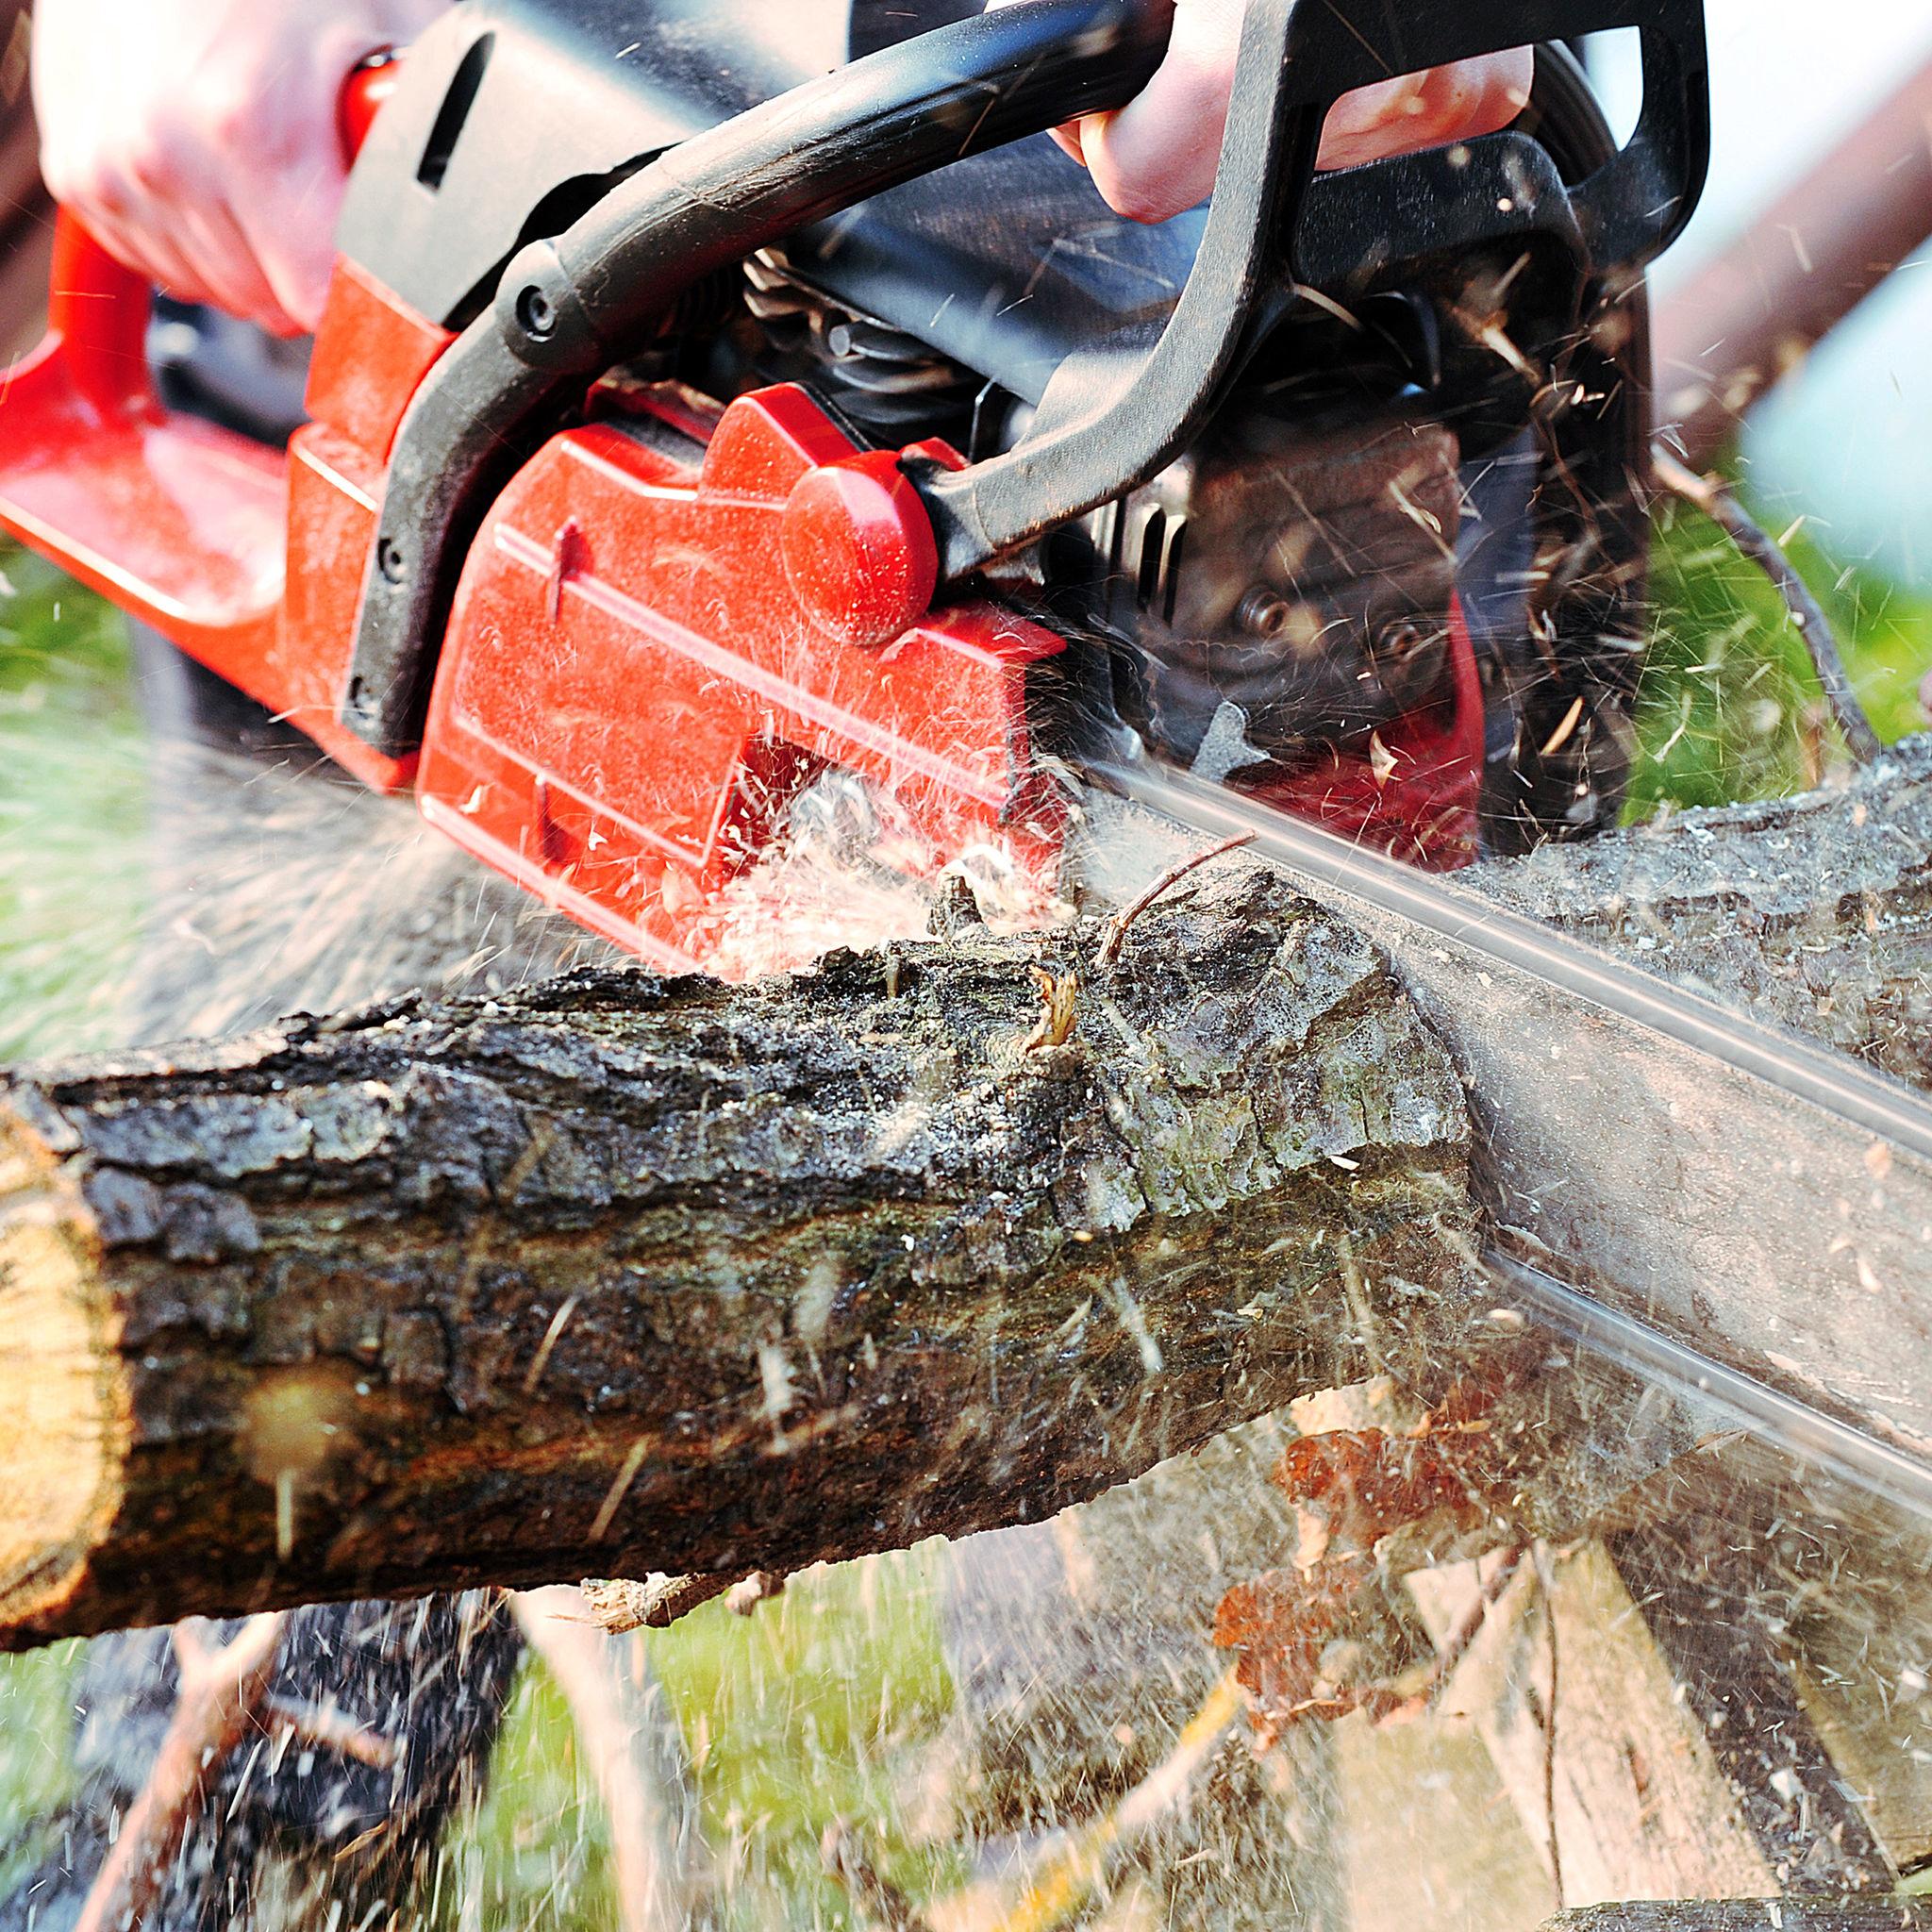 Texas Cowboy's Tree Service image 3